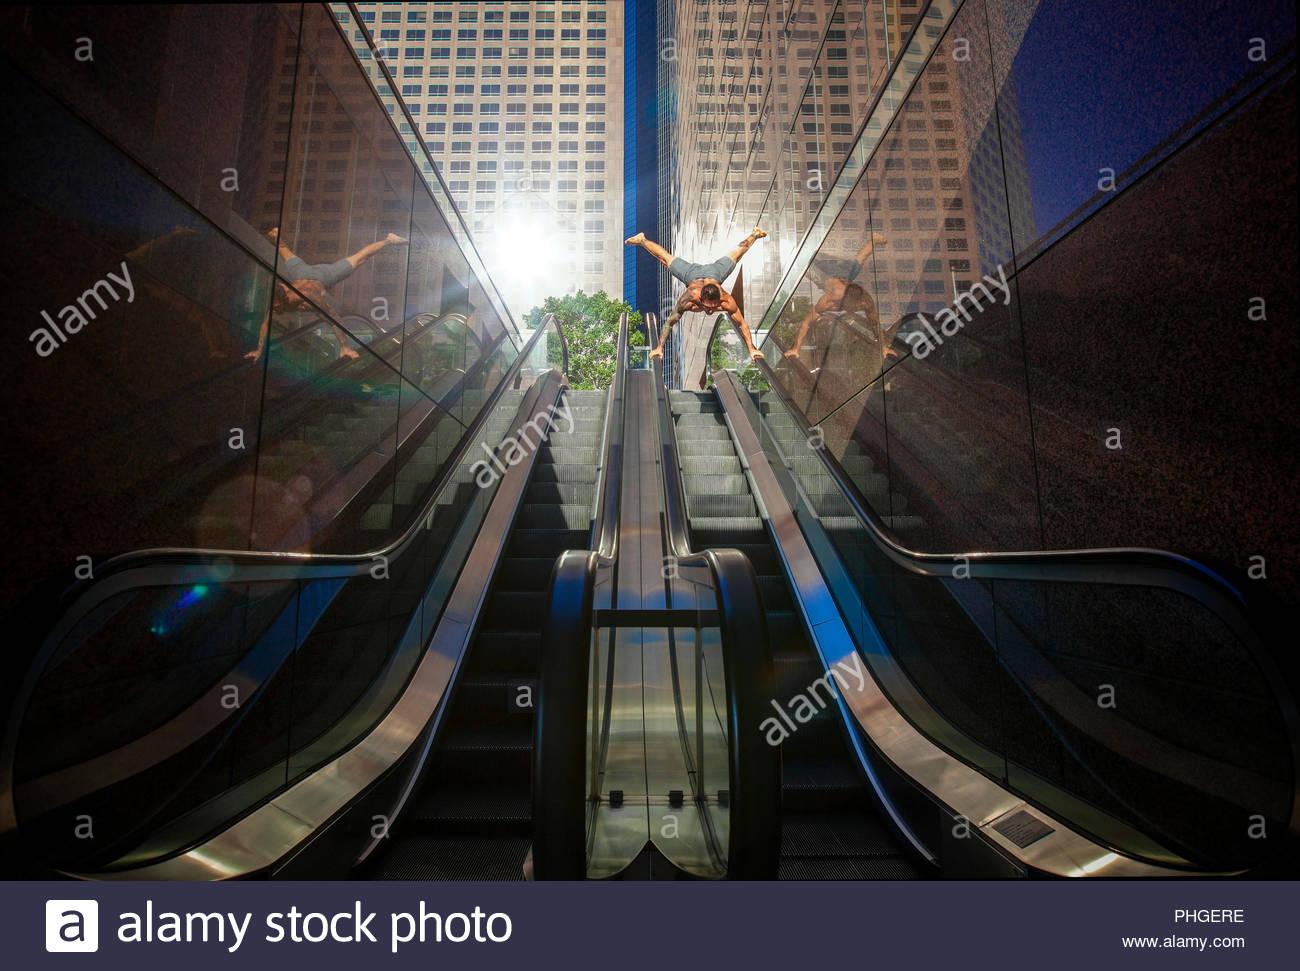 Shirtless man doing handstand on escalator Photo Stock